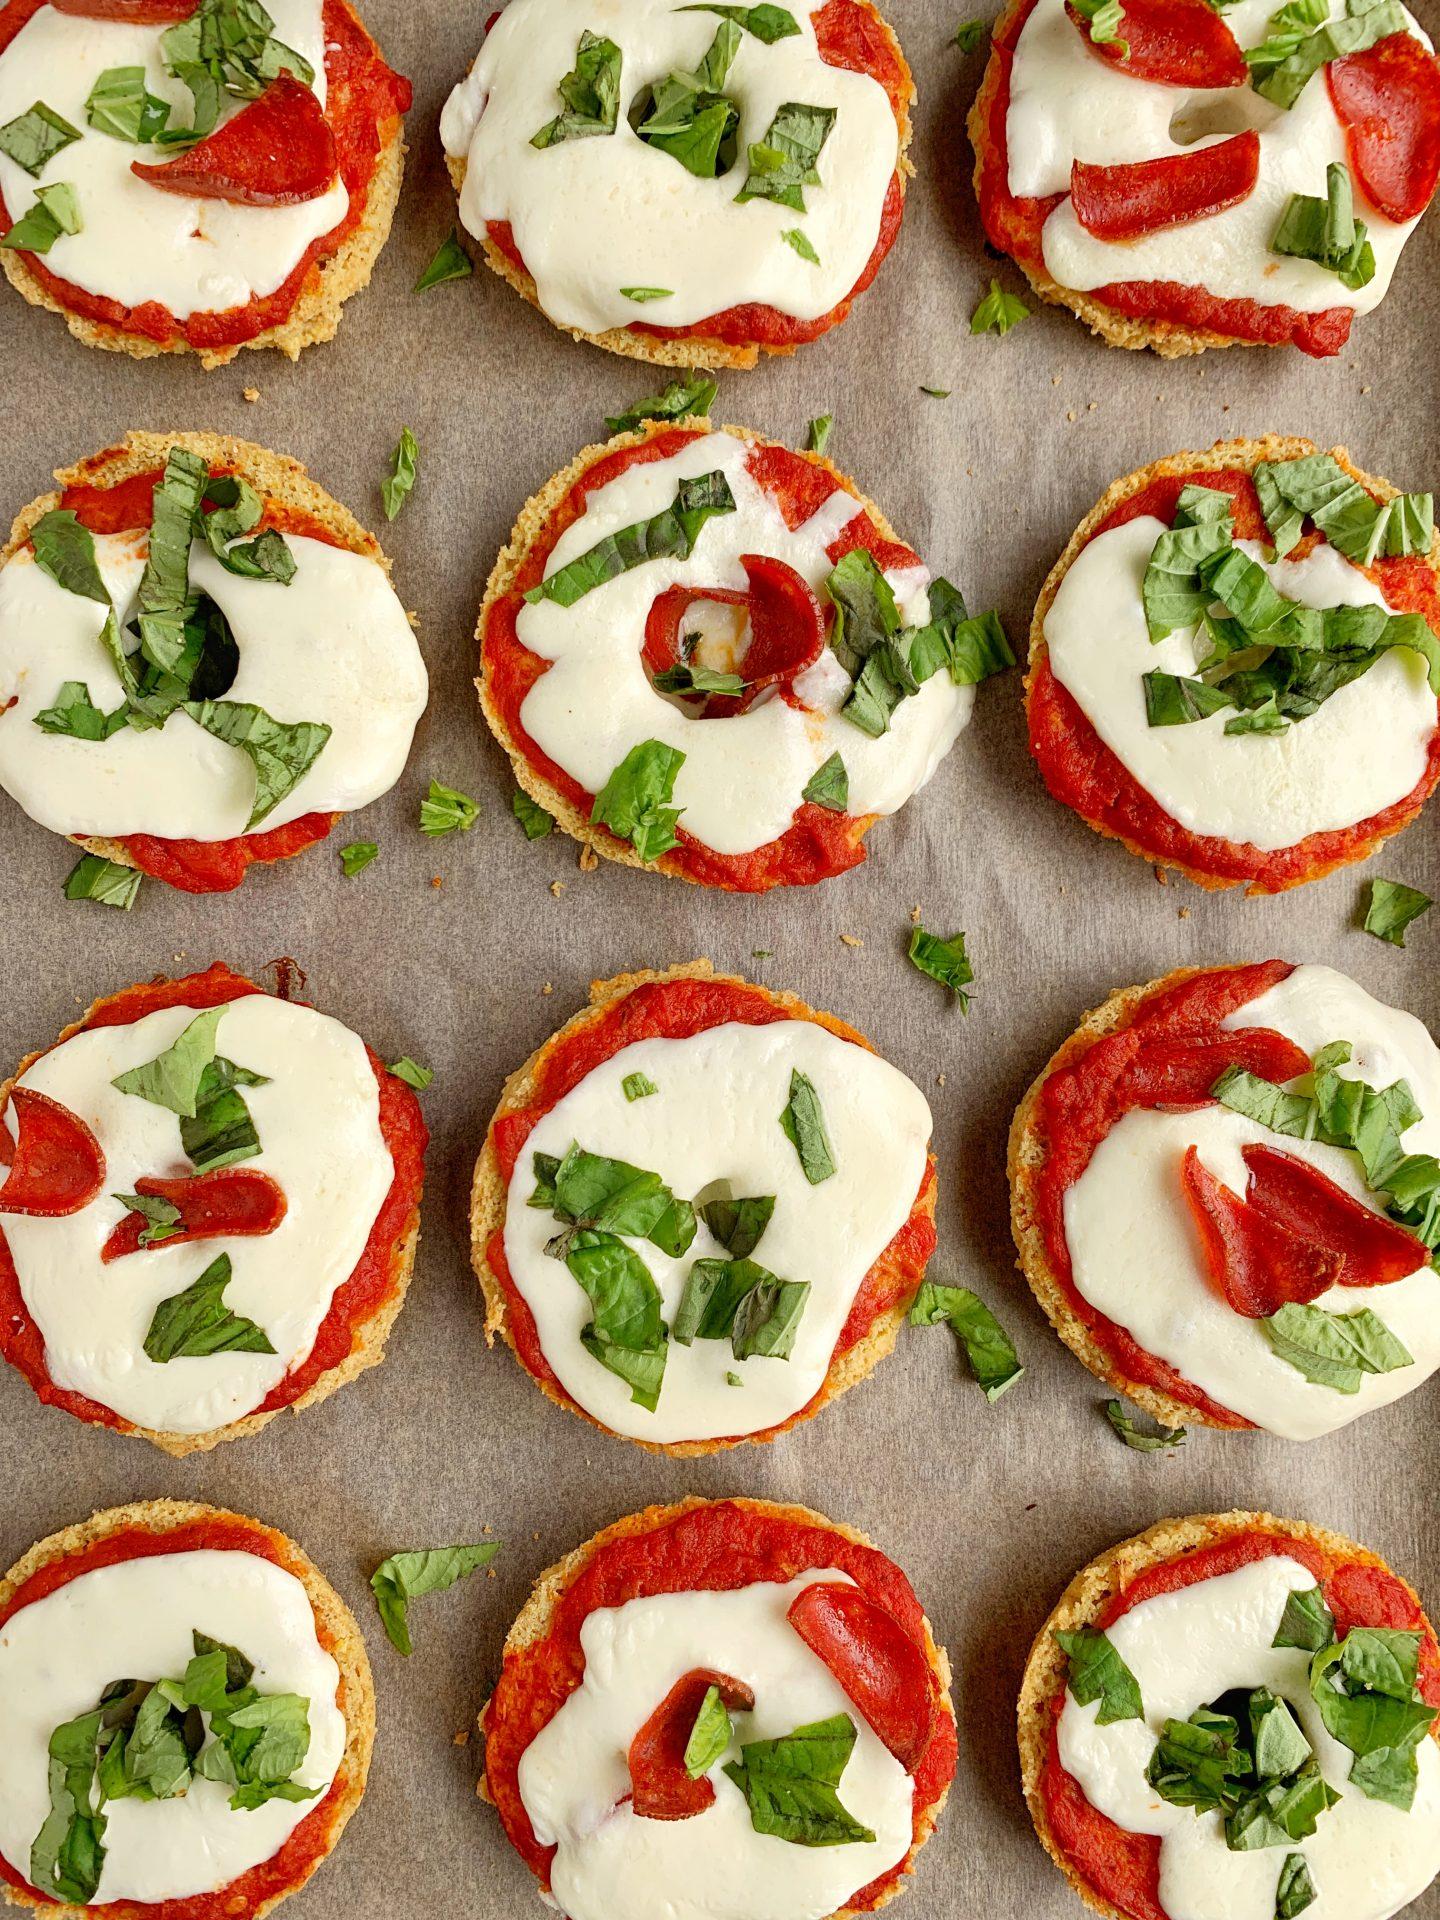 Healthy Homemade Pizza Bagels Gluten Free Rachlmansfield